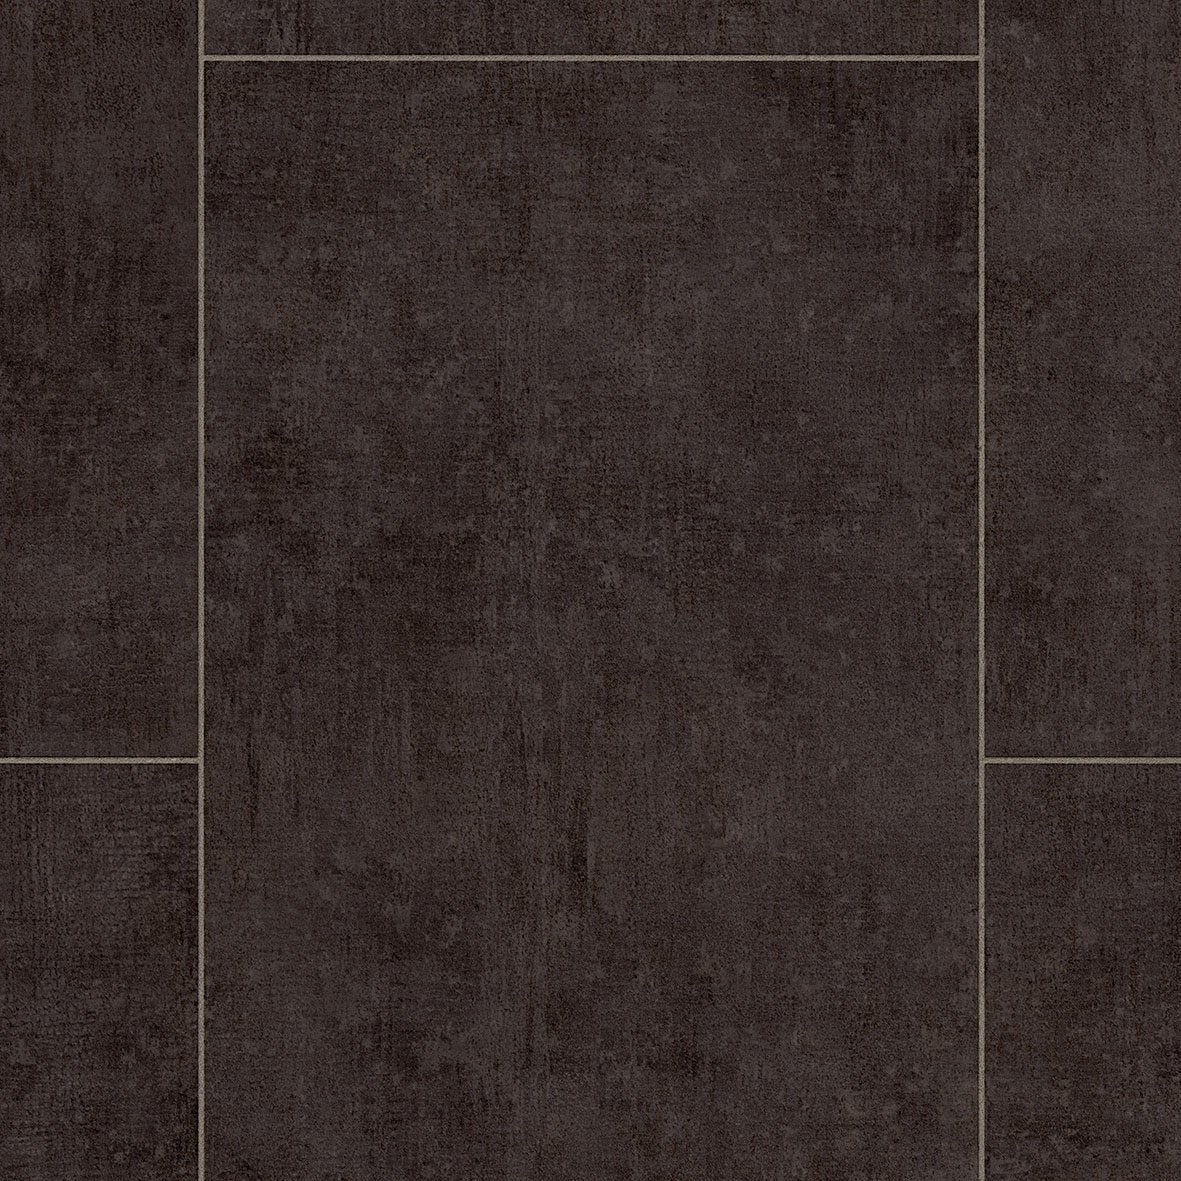 sol pvc anthracite carreaux alfa premium tex l 4 m leroy. Black Bedroom Furniture Sets. Home Design Ideas